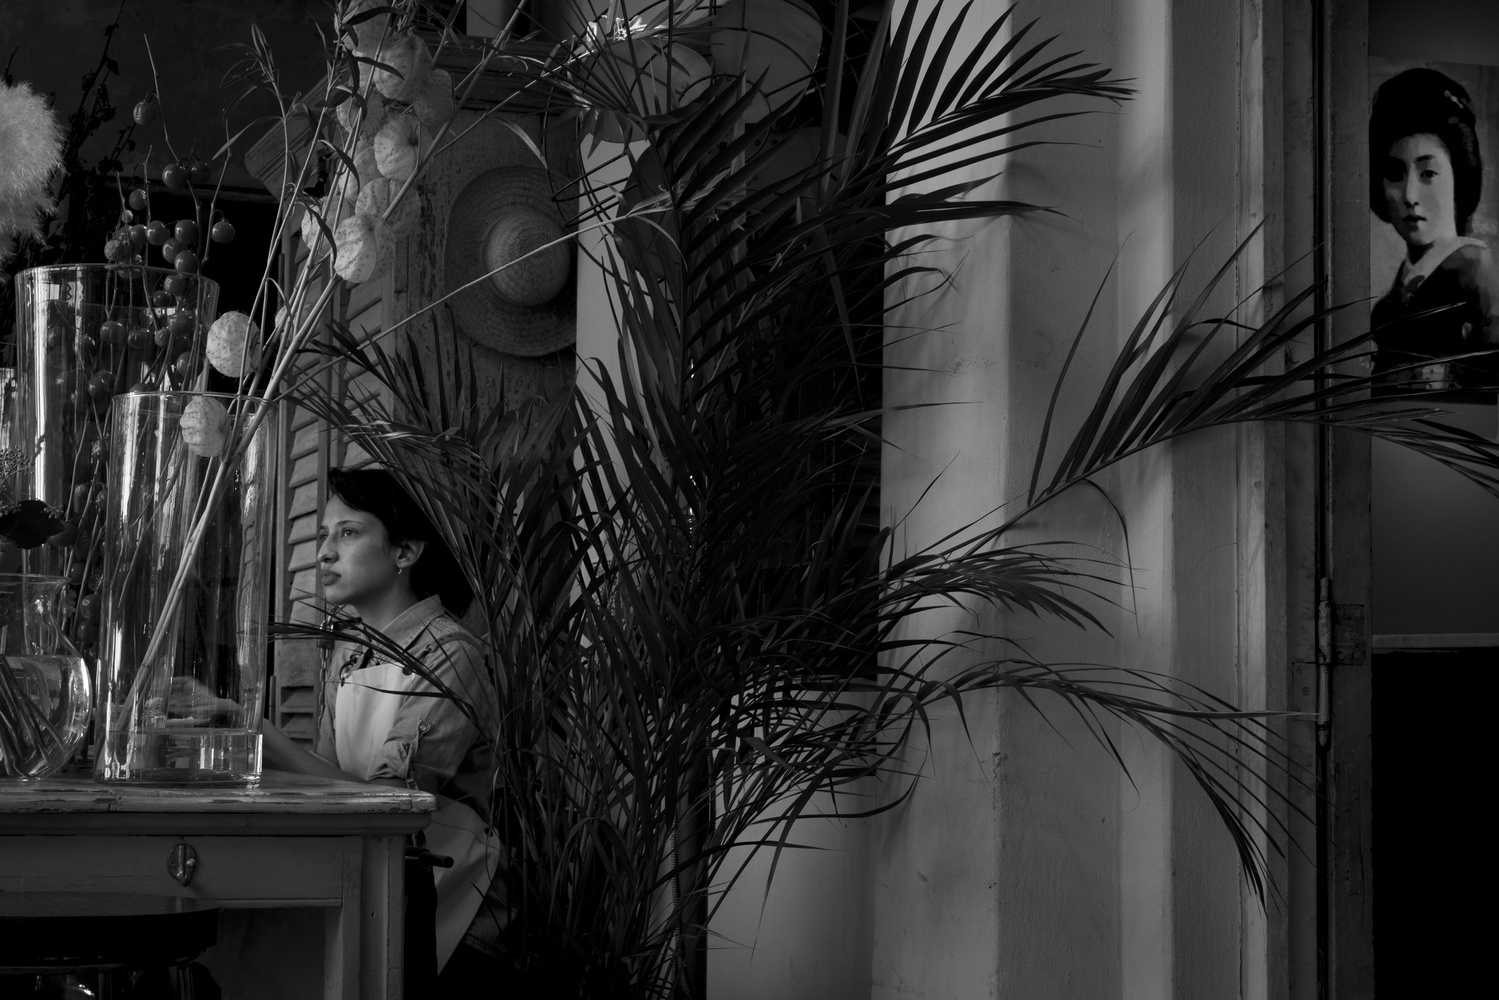 The Florist by Jose Balta